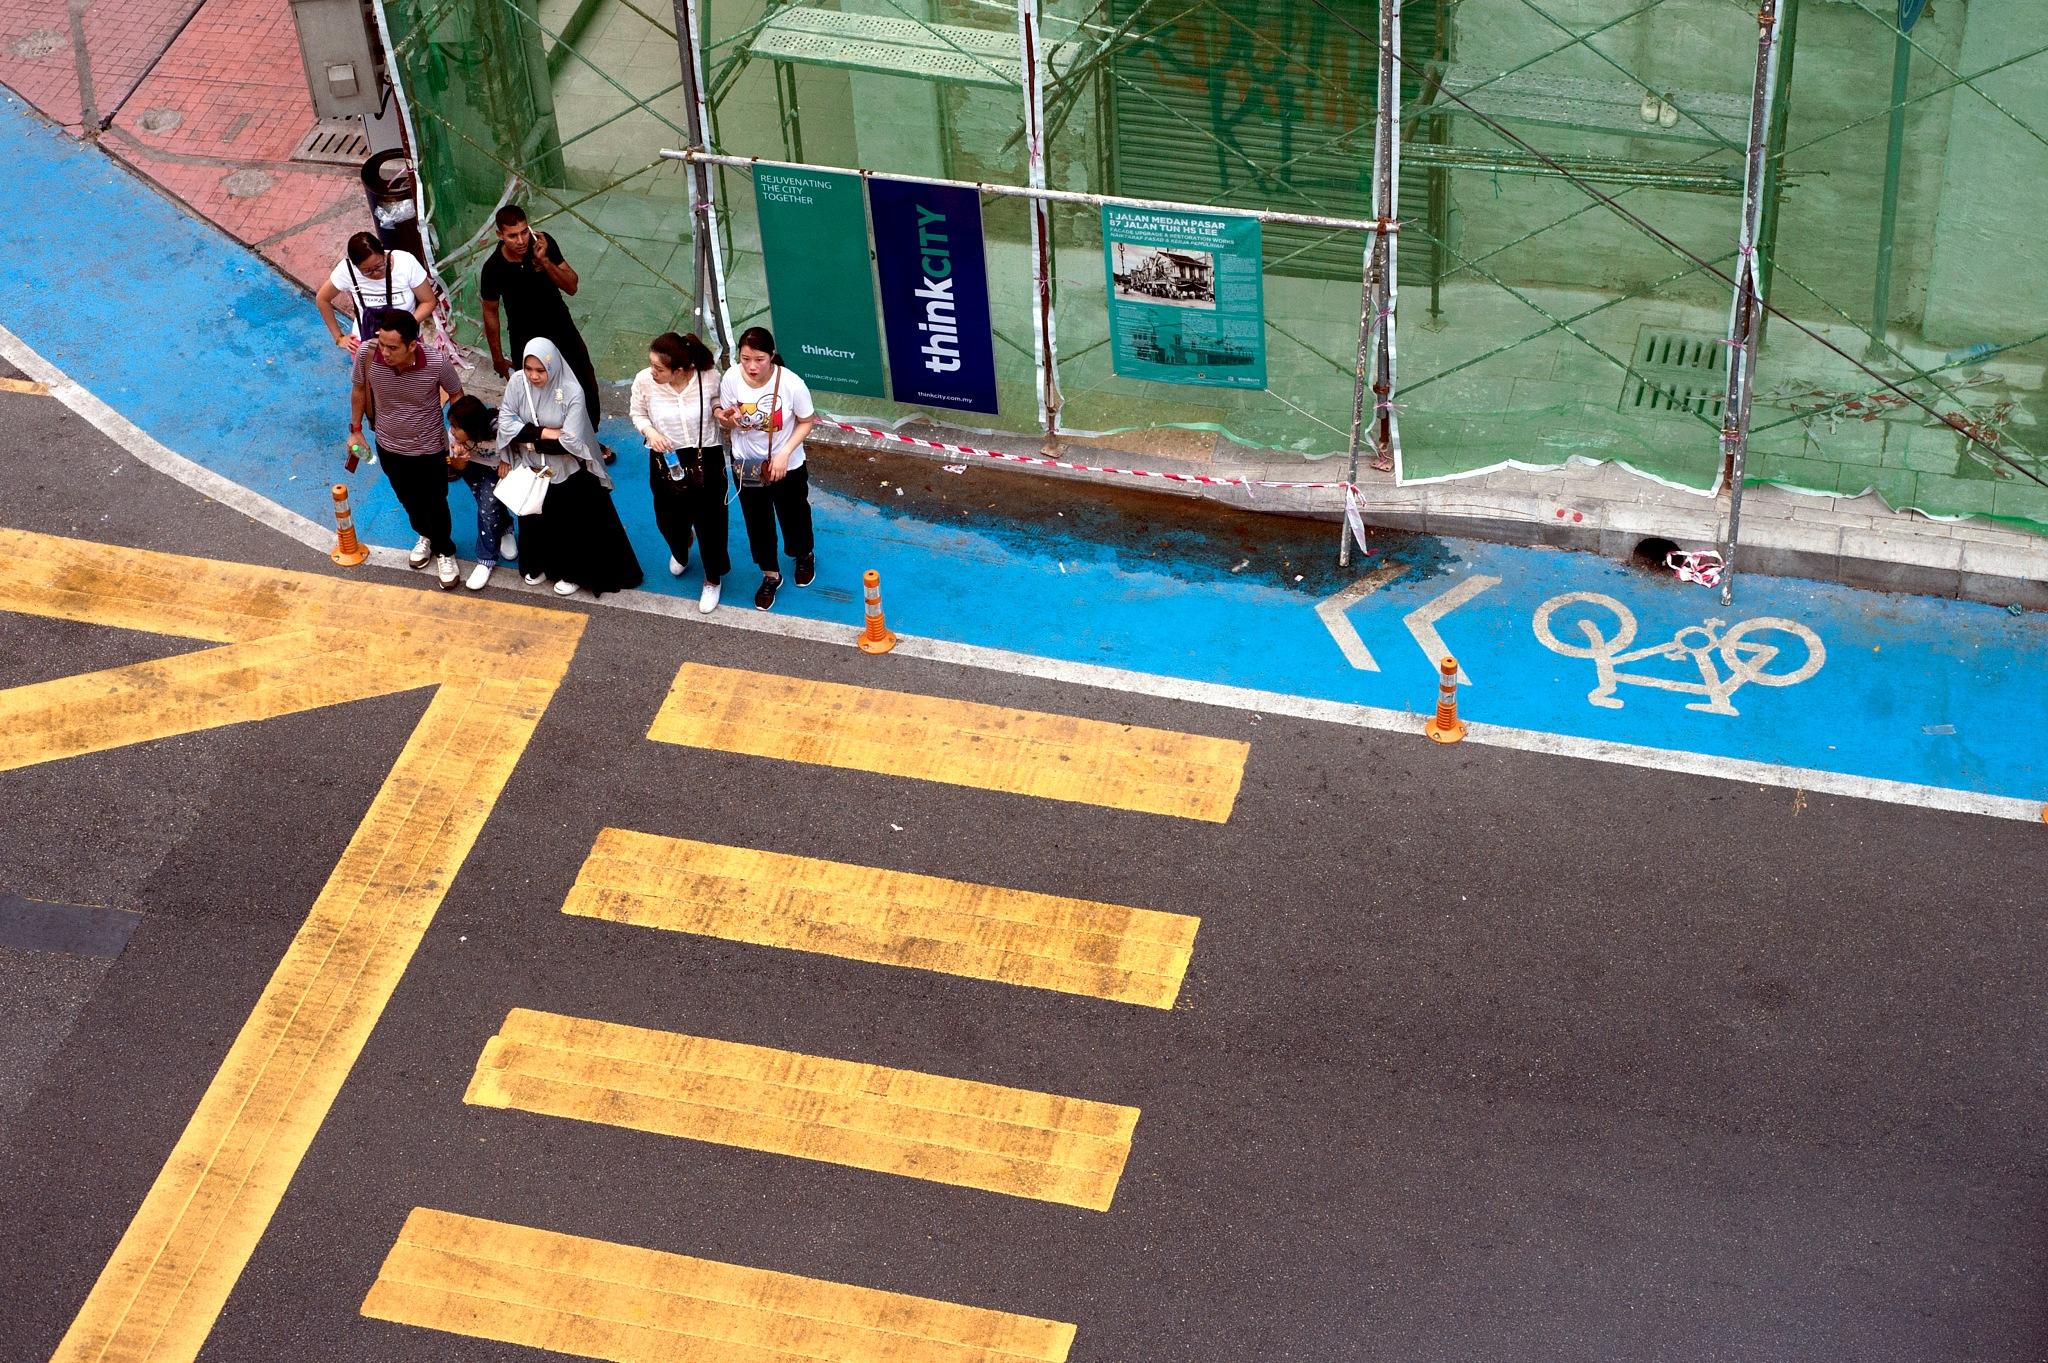 crossing by Mustaffa Tapa Otai